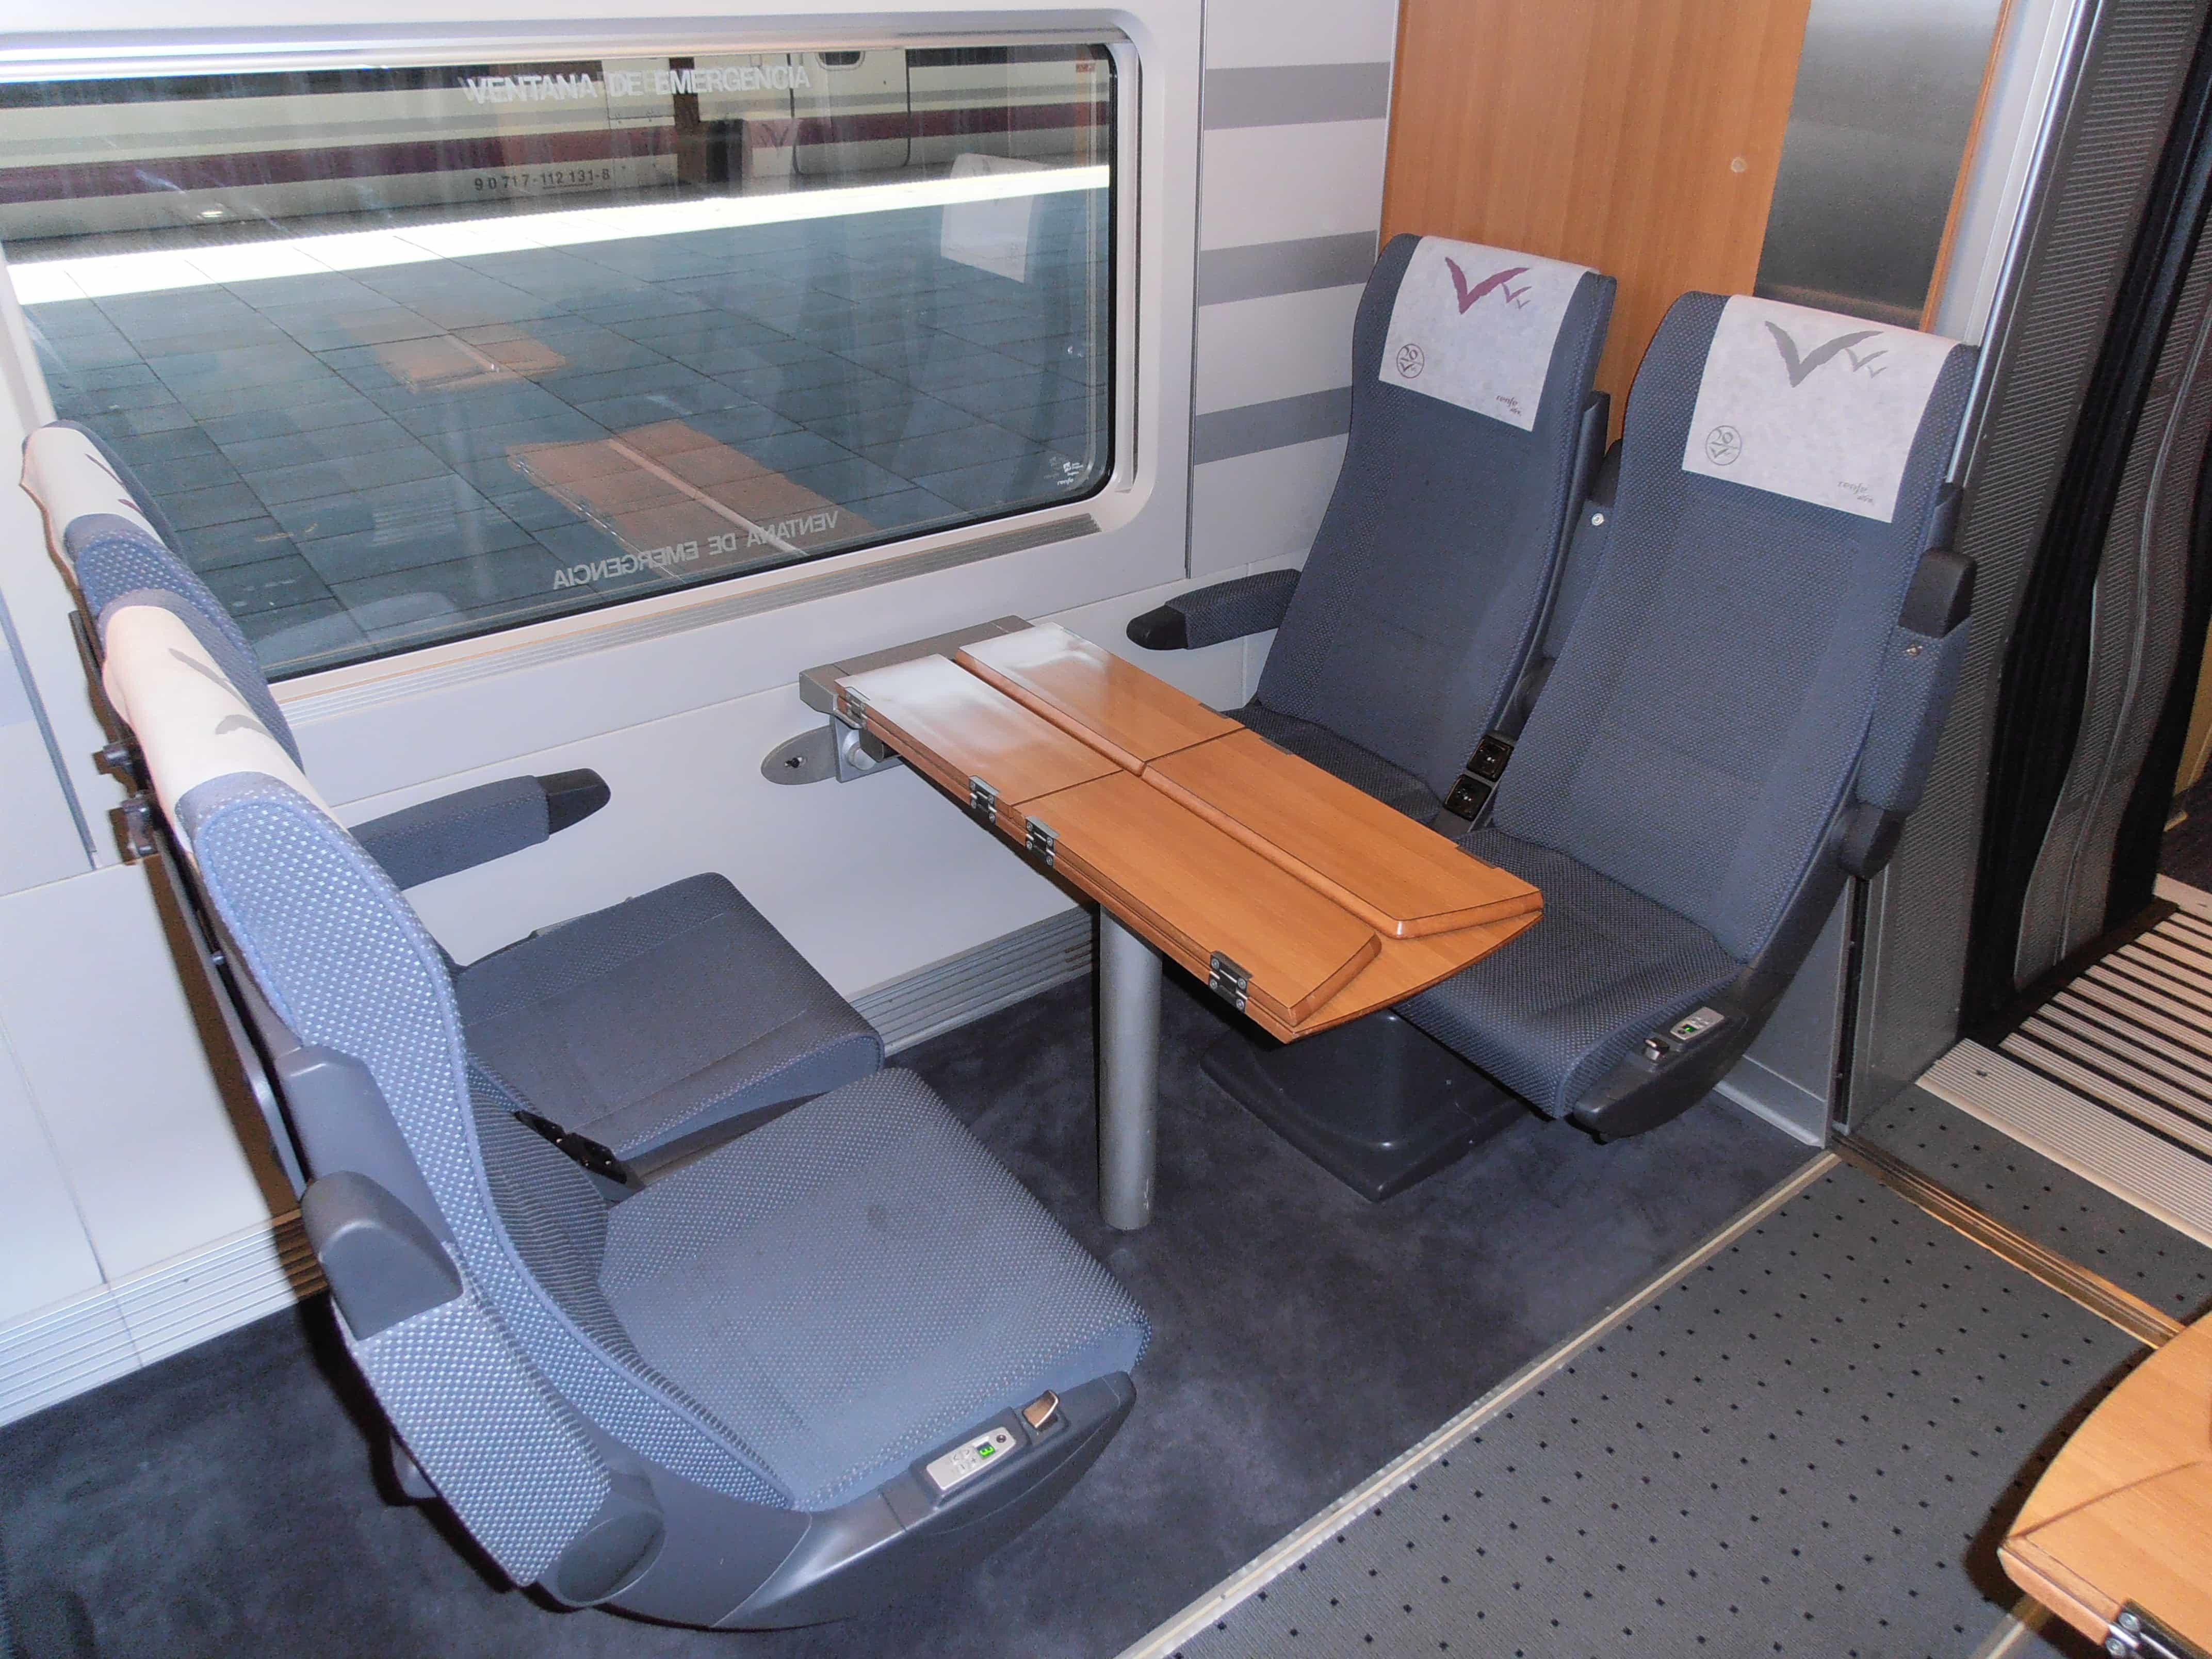 4 Tips interesantes para ahorrar en viajes en AVE y tren a nivel familiar o en grupos. 2